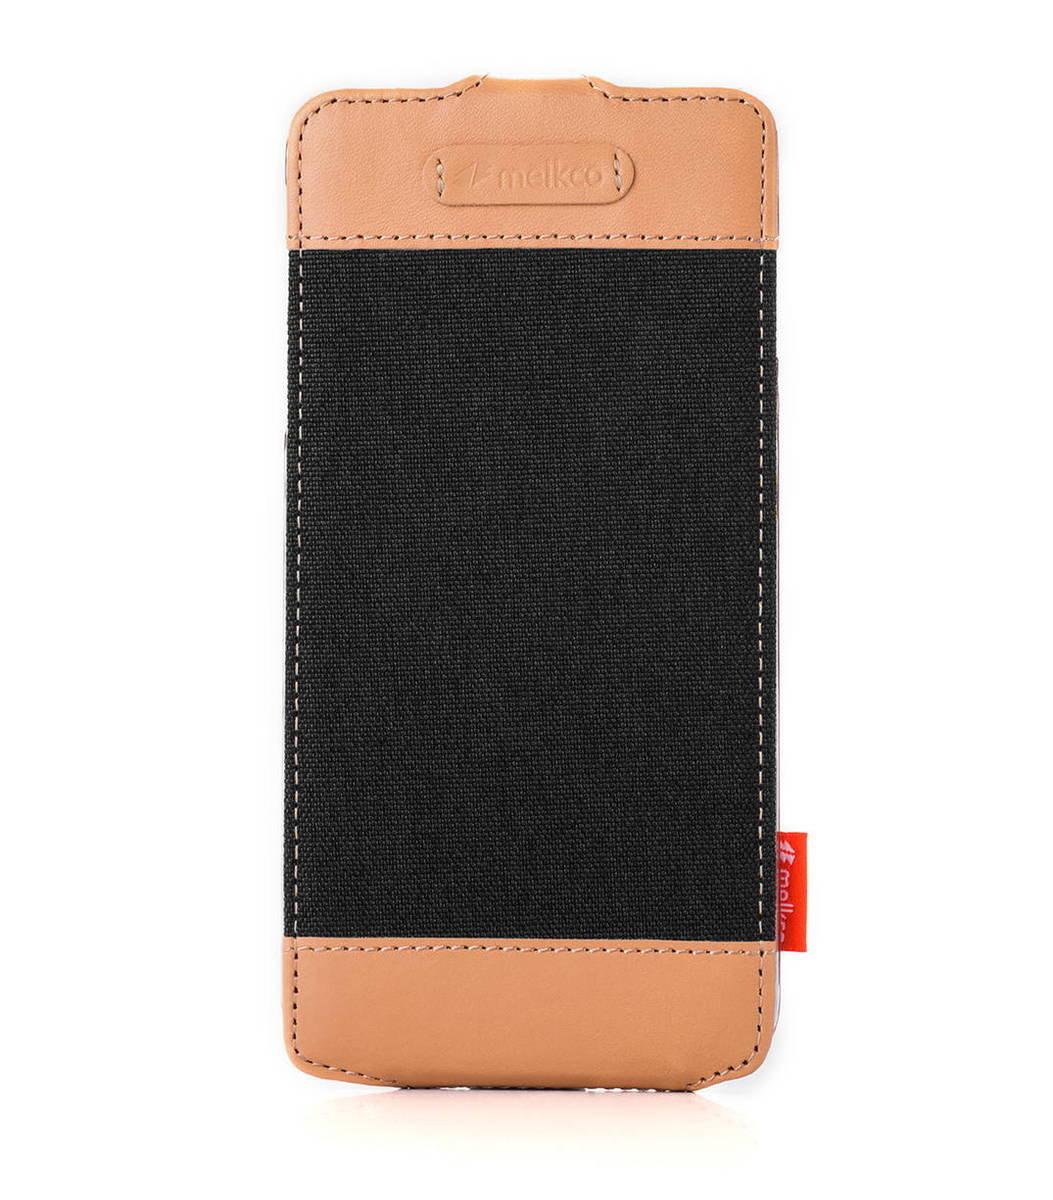 "Apple Iphone 6 Plus/6s Plus (5.5"") Jacka Type Cru系列高級時尚真皮手機套(黑色)"